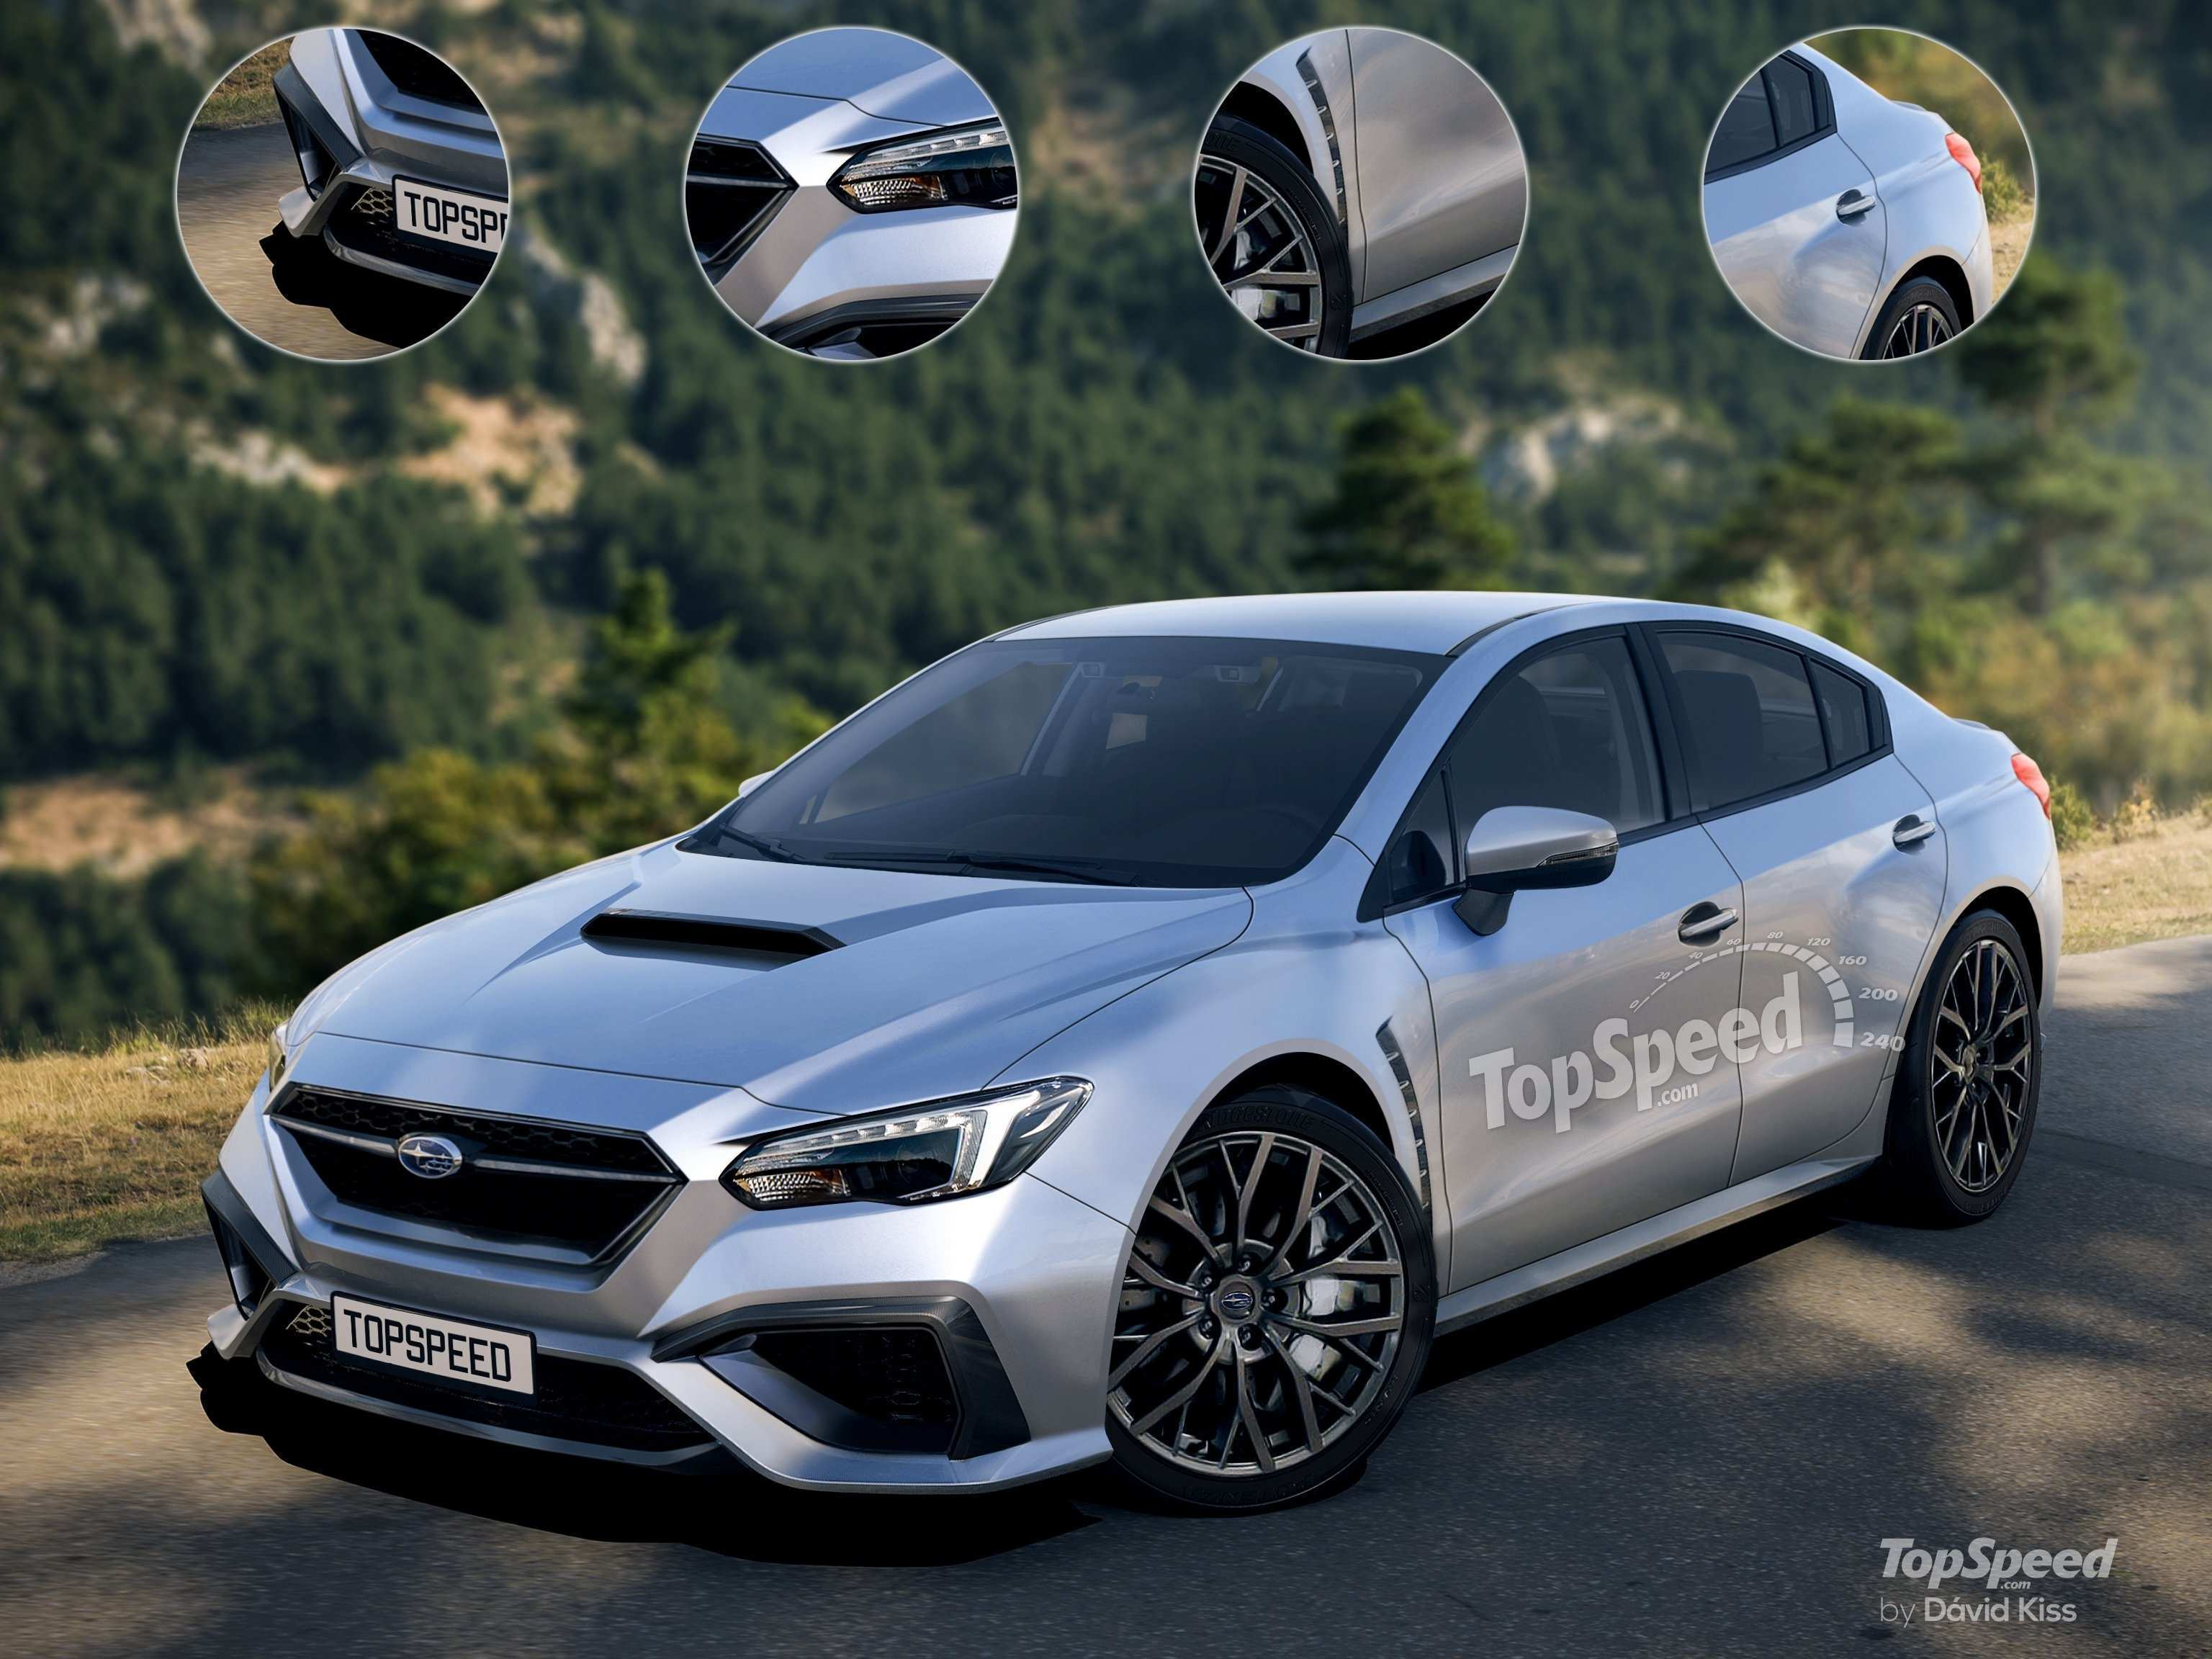 93 Great 2020 Subaru Towing Capacity Reviews by 2020 Subaru Towing Capacity